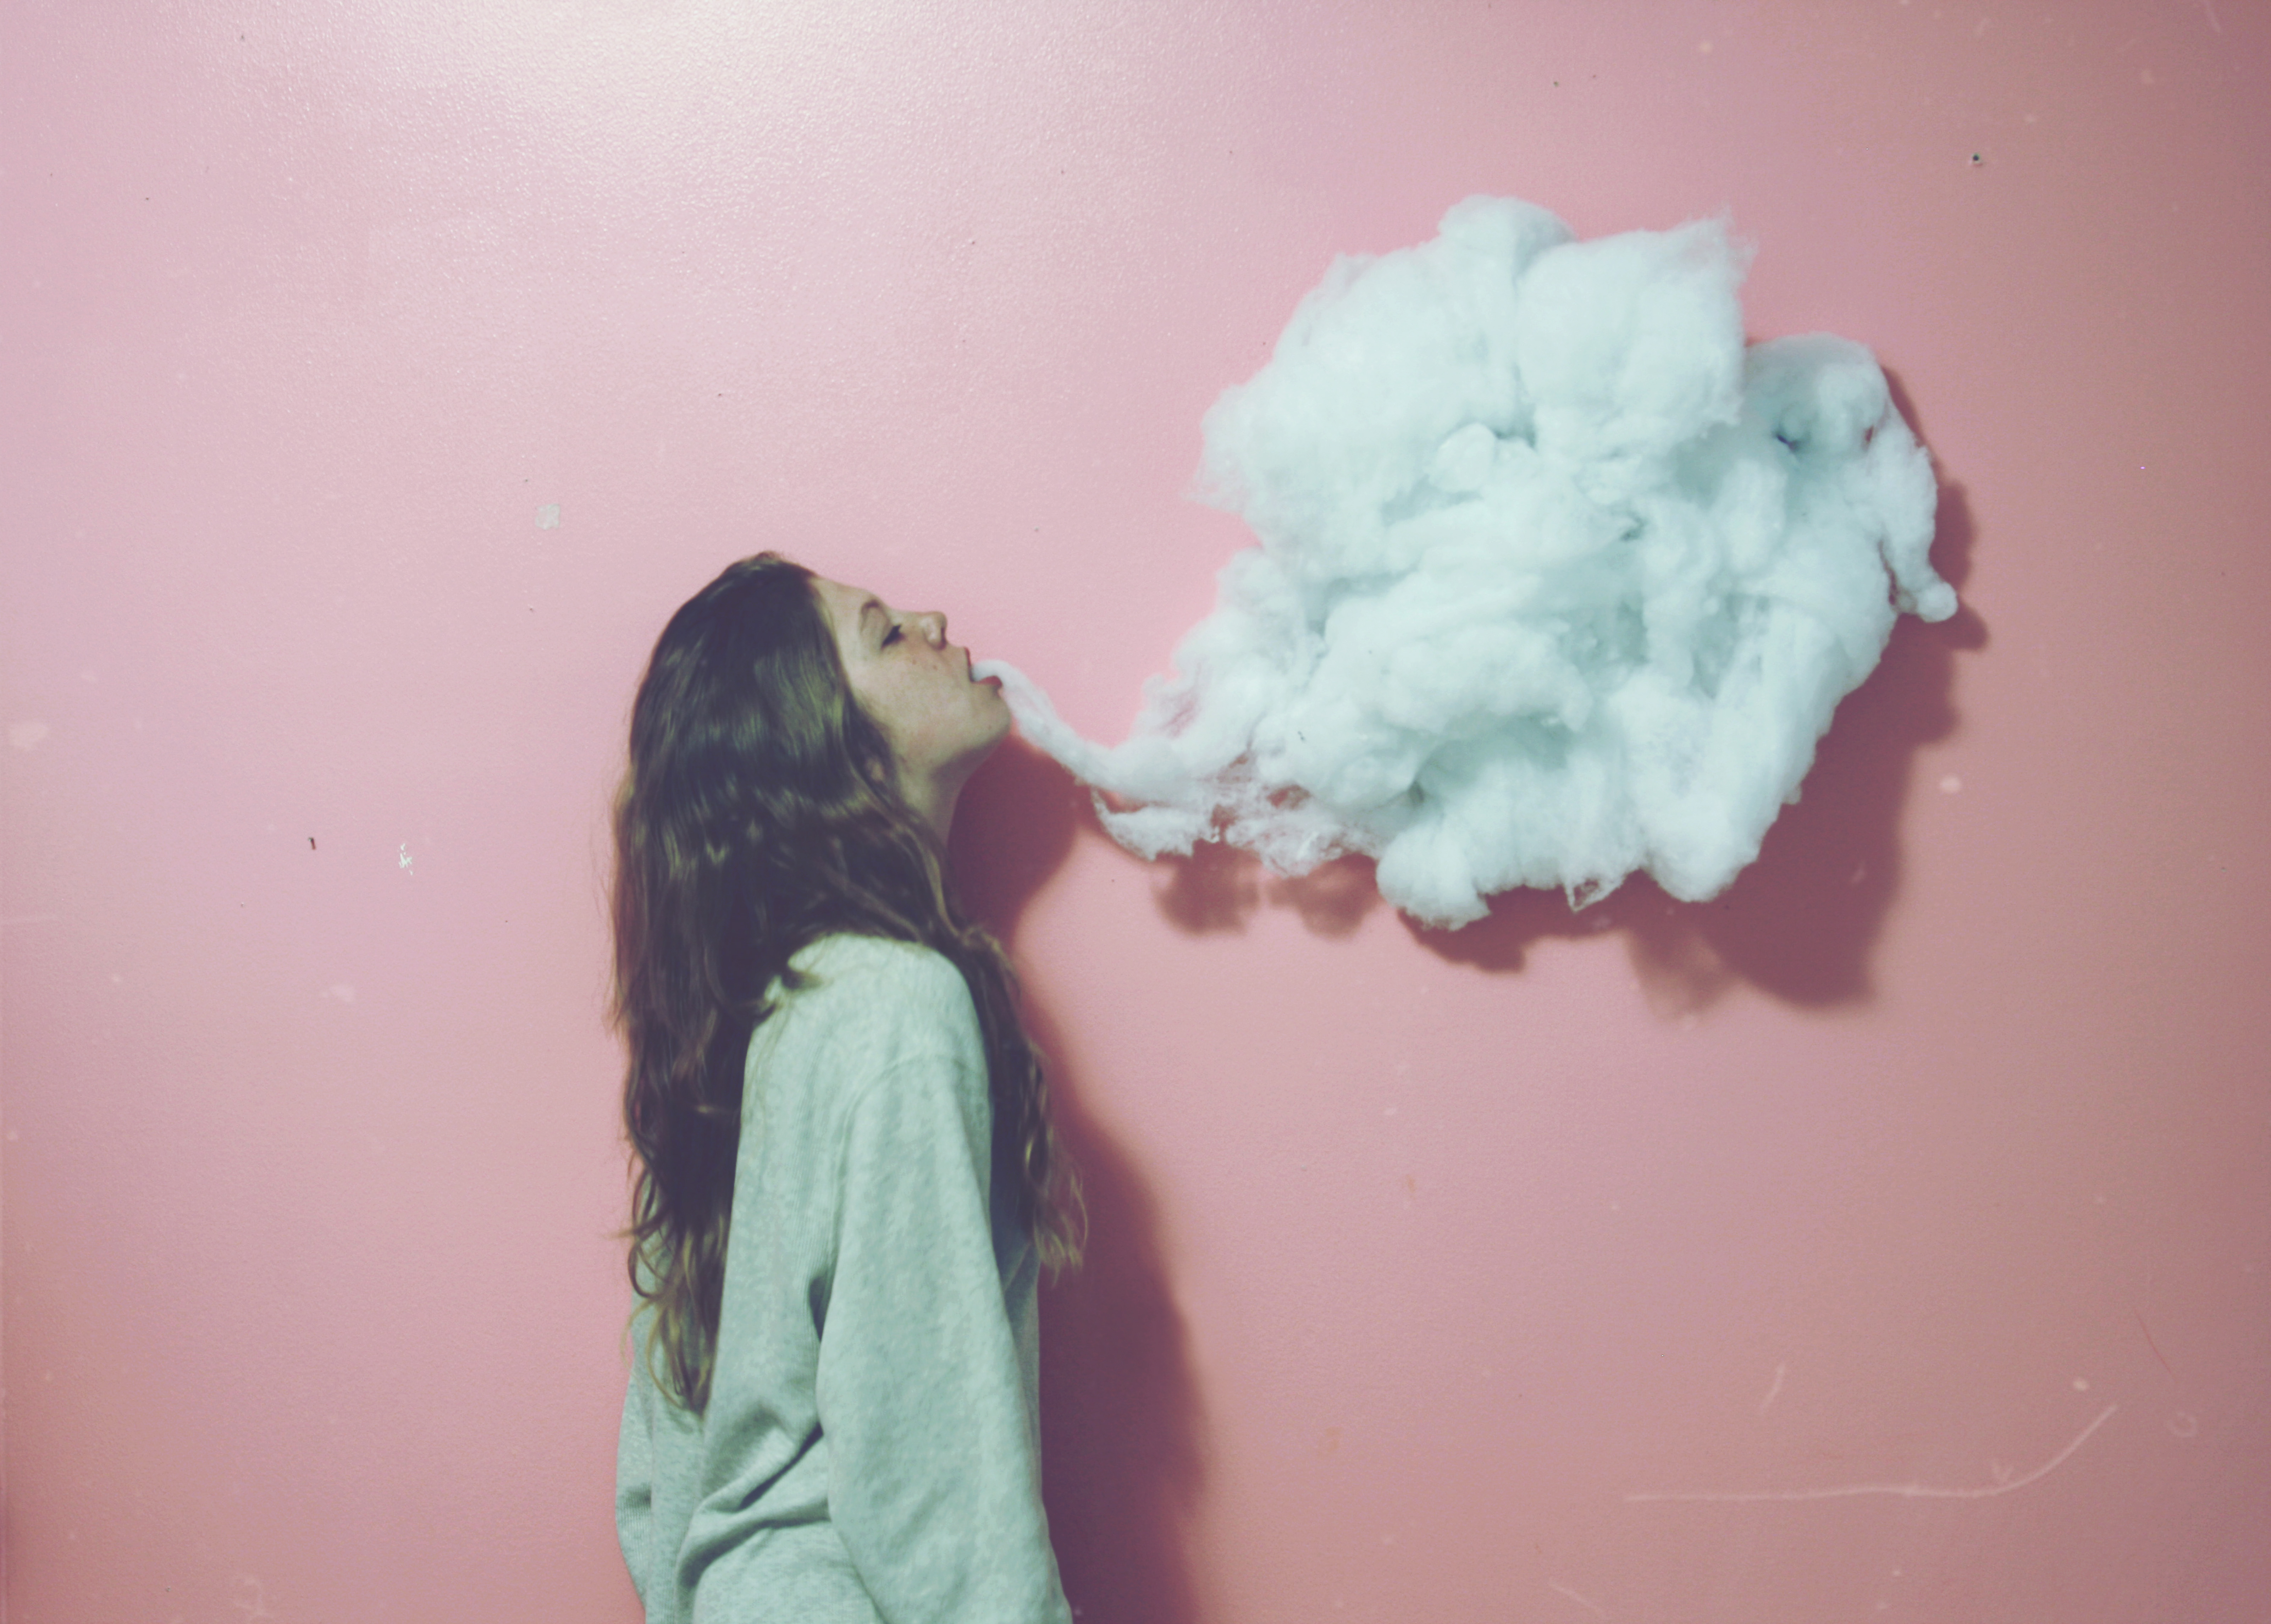 Color Smoke Clouds Colorful Smoke Clouds Tumblr